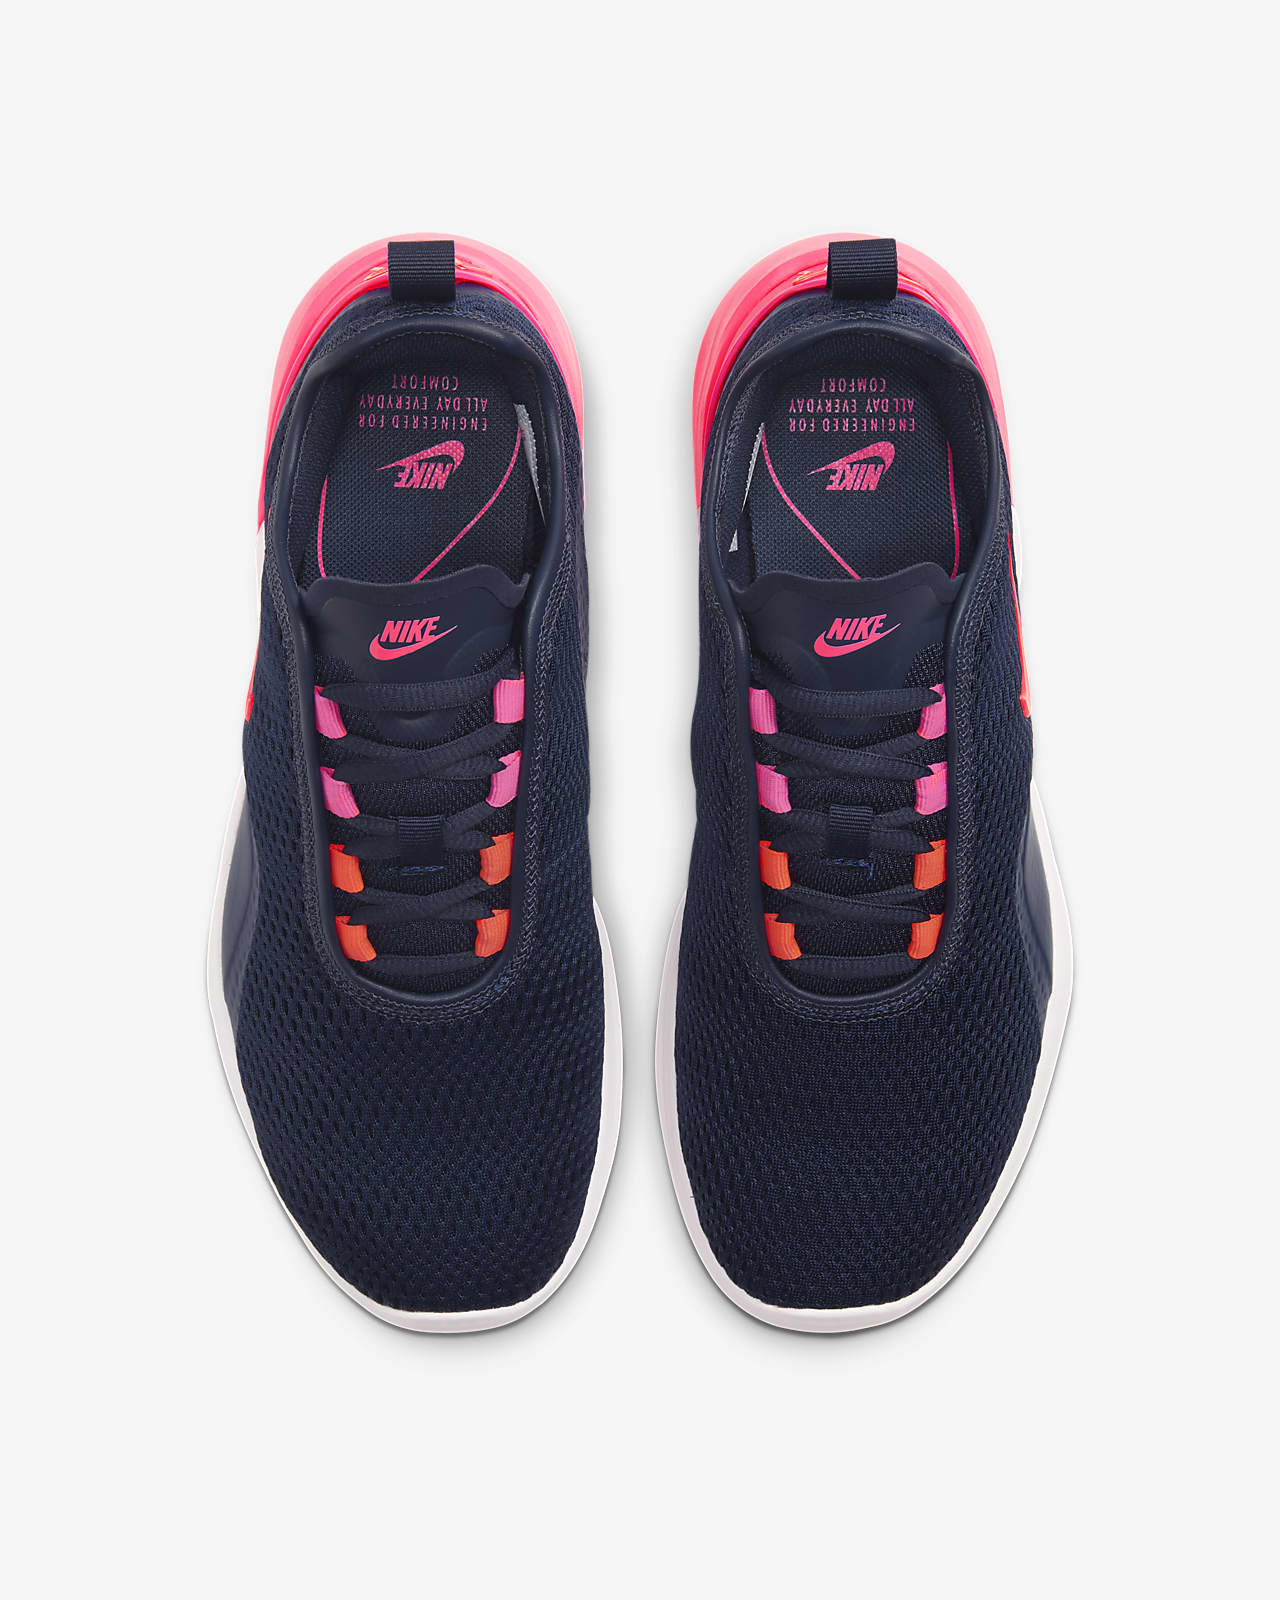 nike motion zapatos mujer